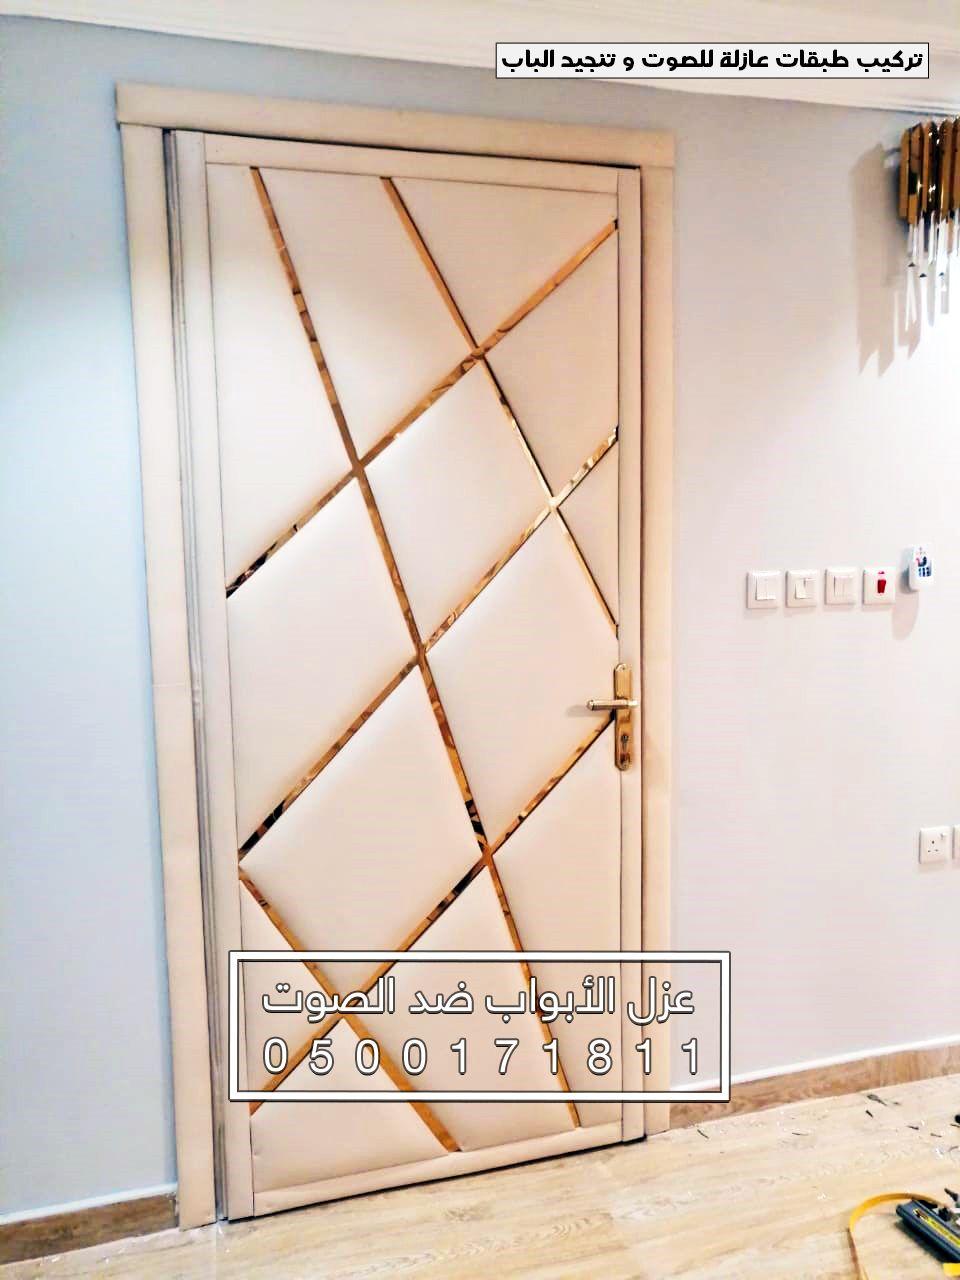 تركيب عزل صوت بالرياض Home Decor Decals Home Decor Home